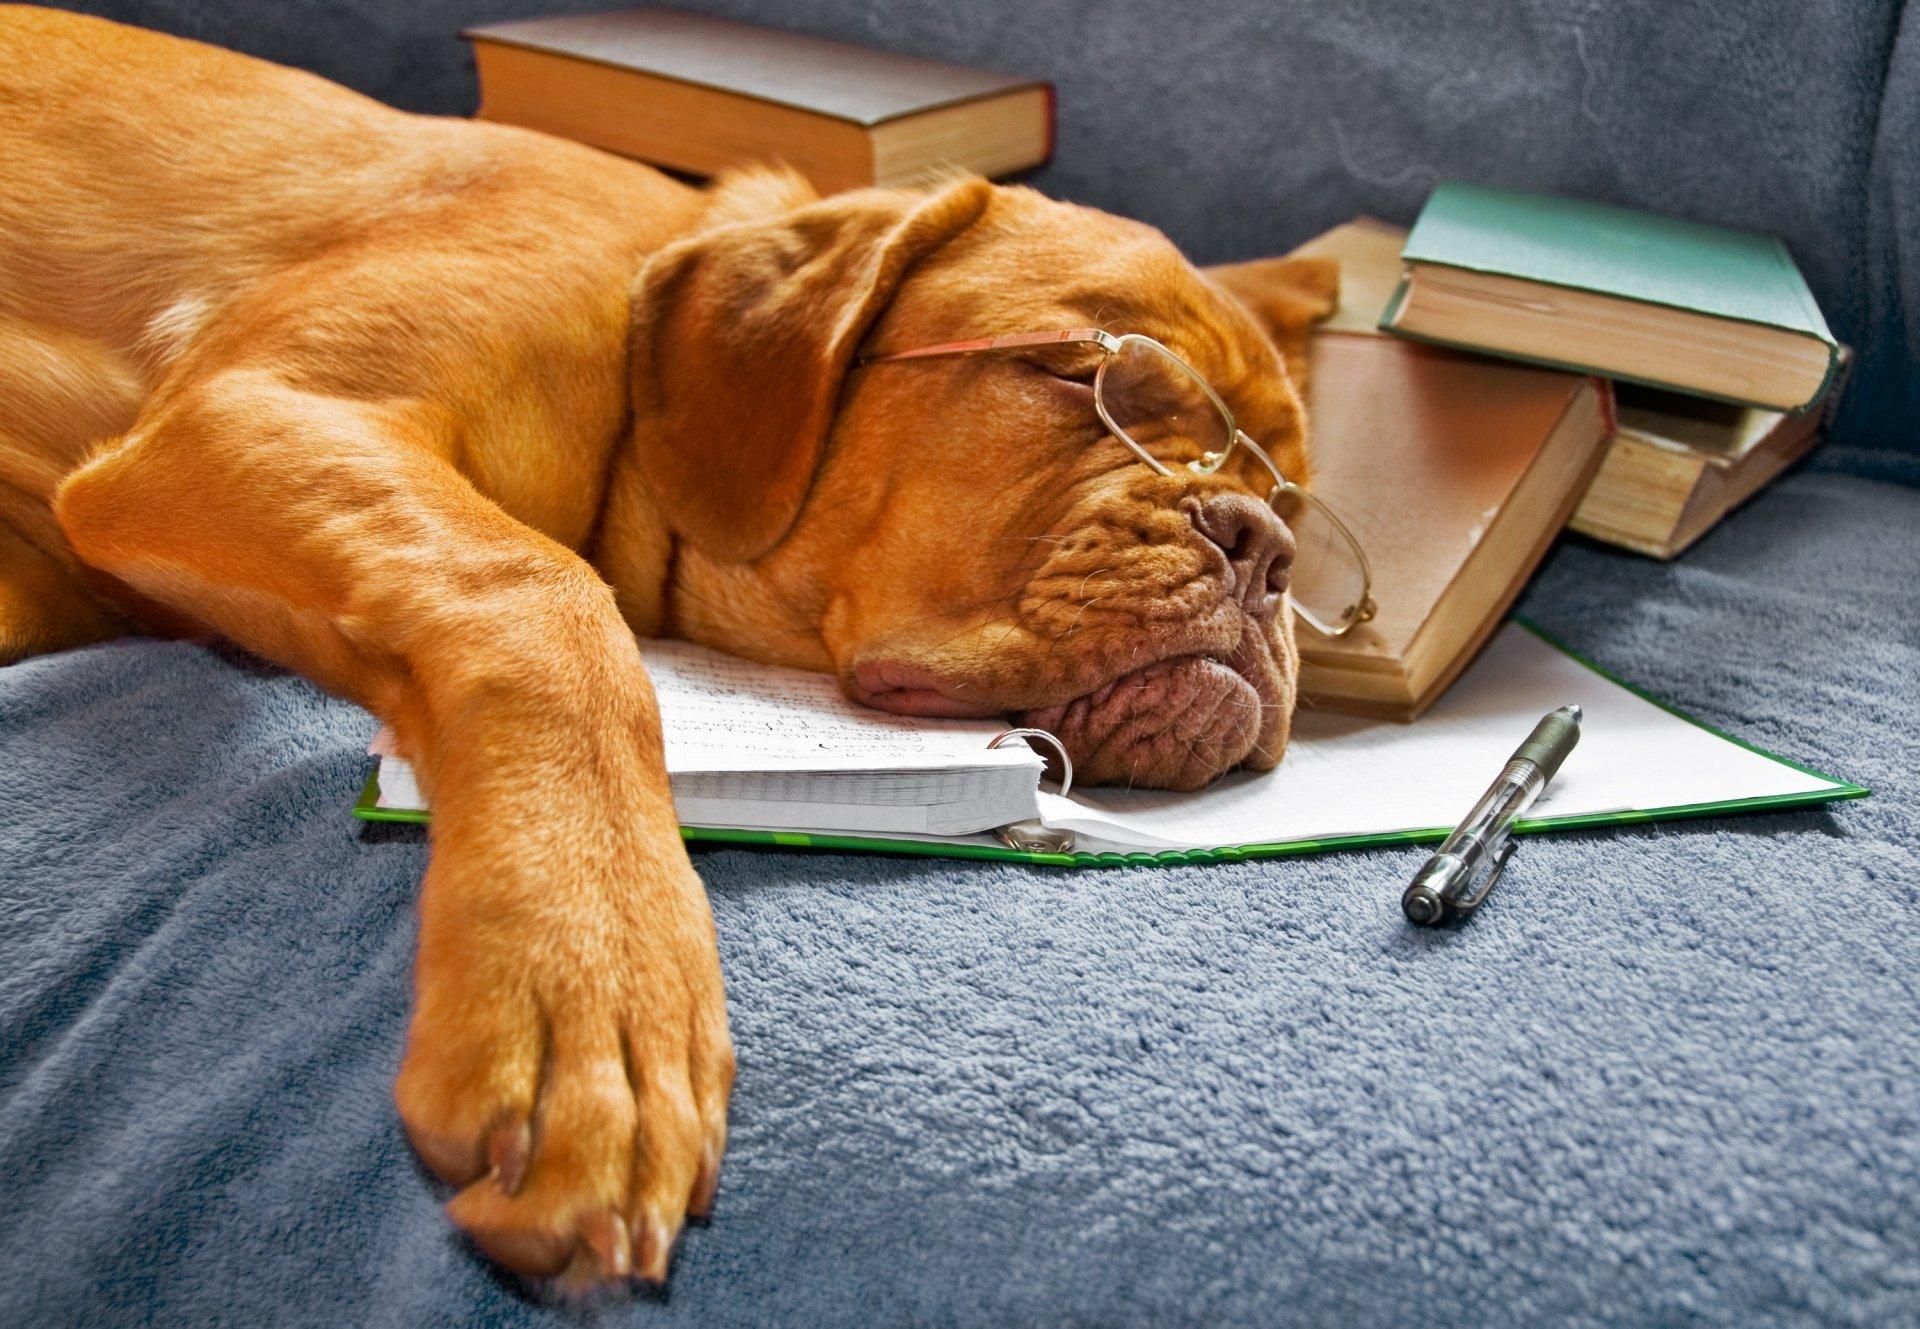 Animal - Dogue de Bordeaux  Dog Glasses Book Mastiff Wallpaper